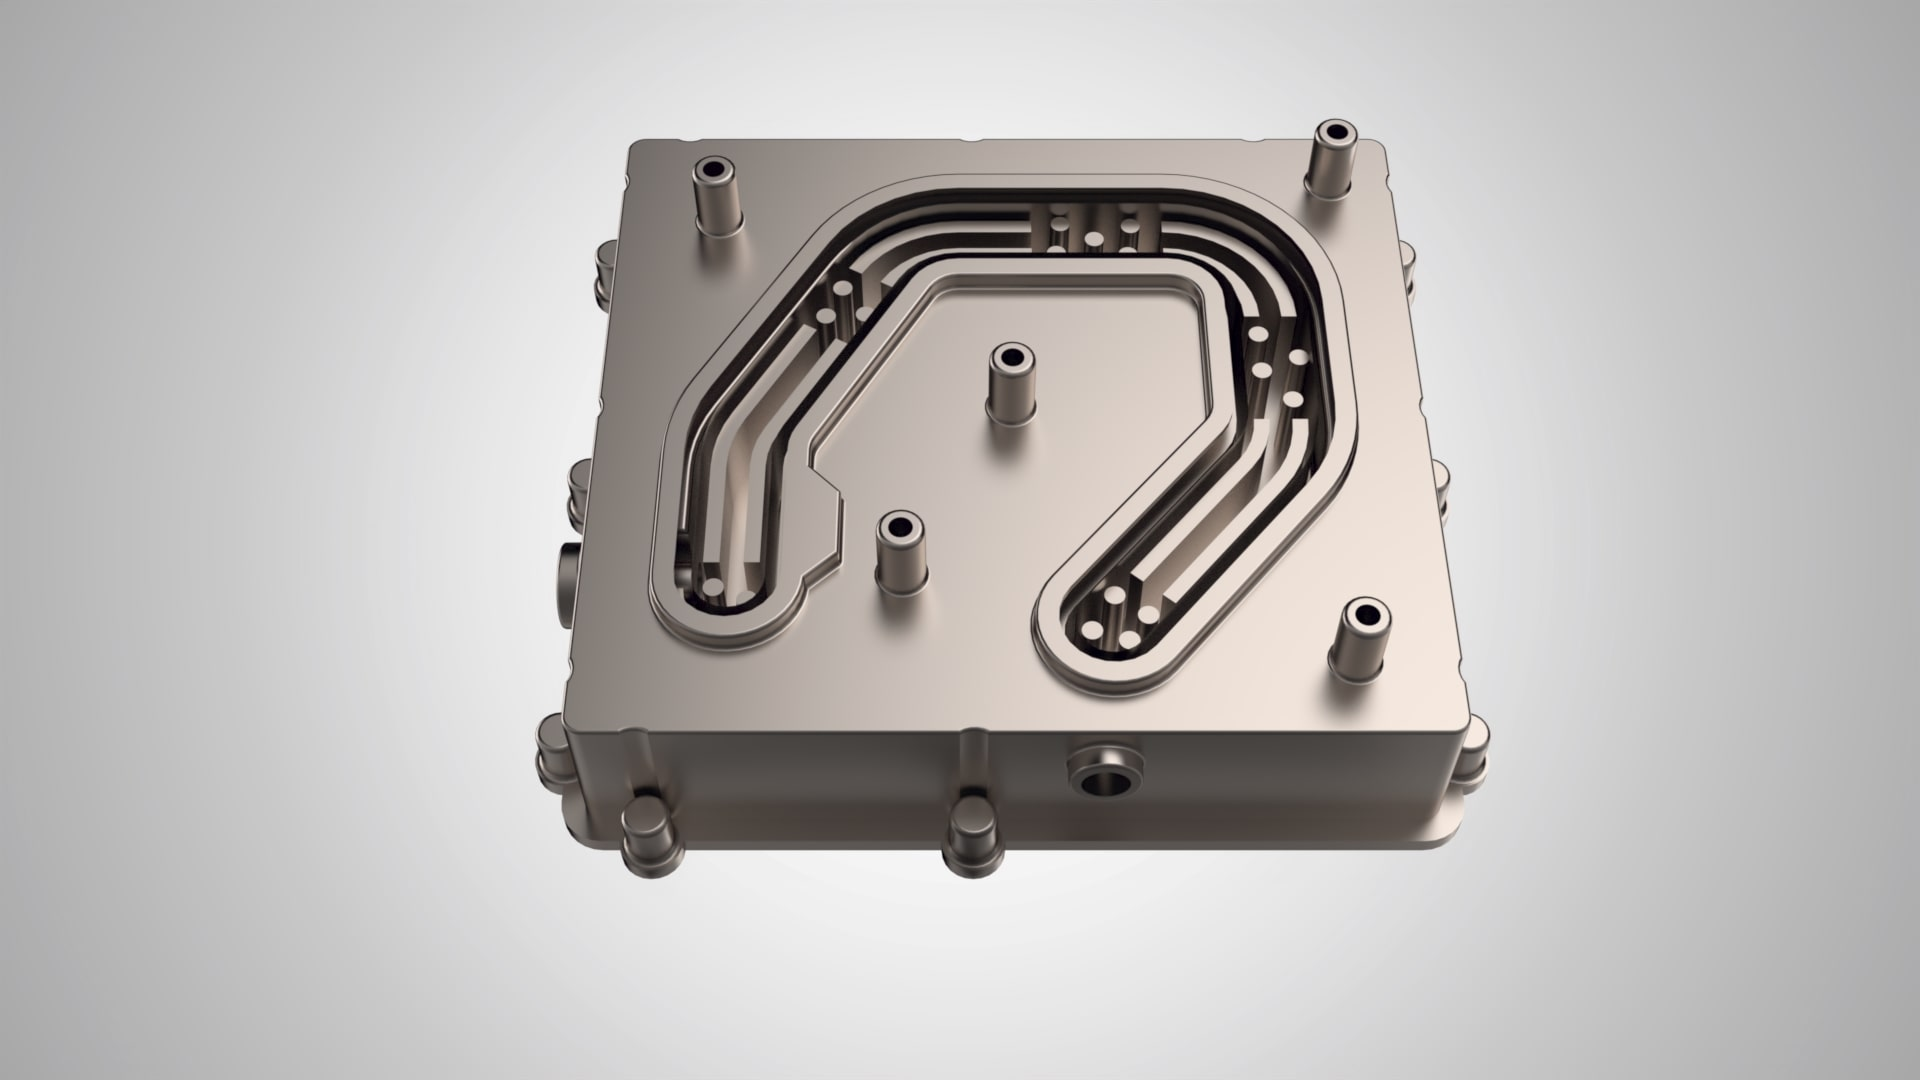 Parte interna de un disipador de calor para E-movilidad